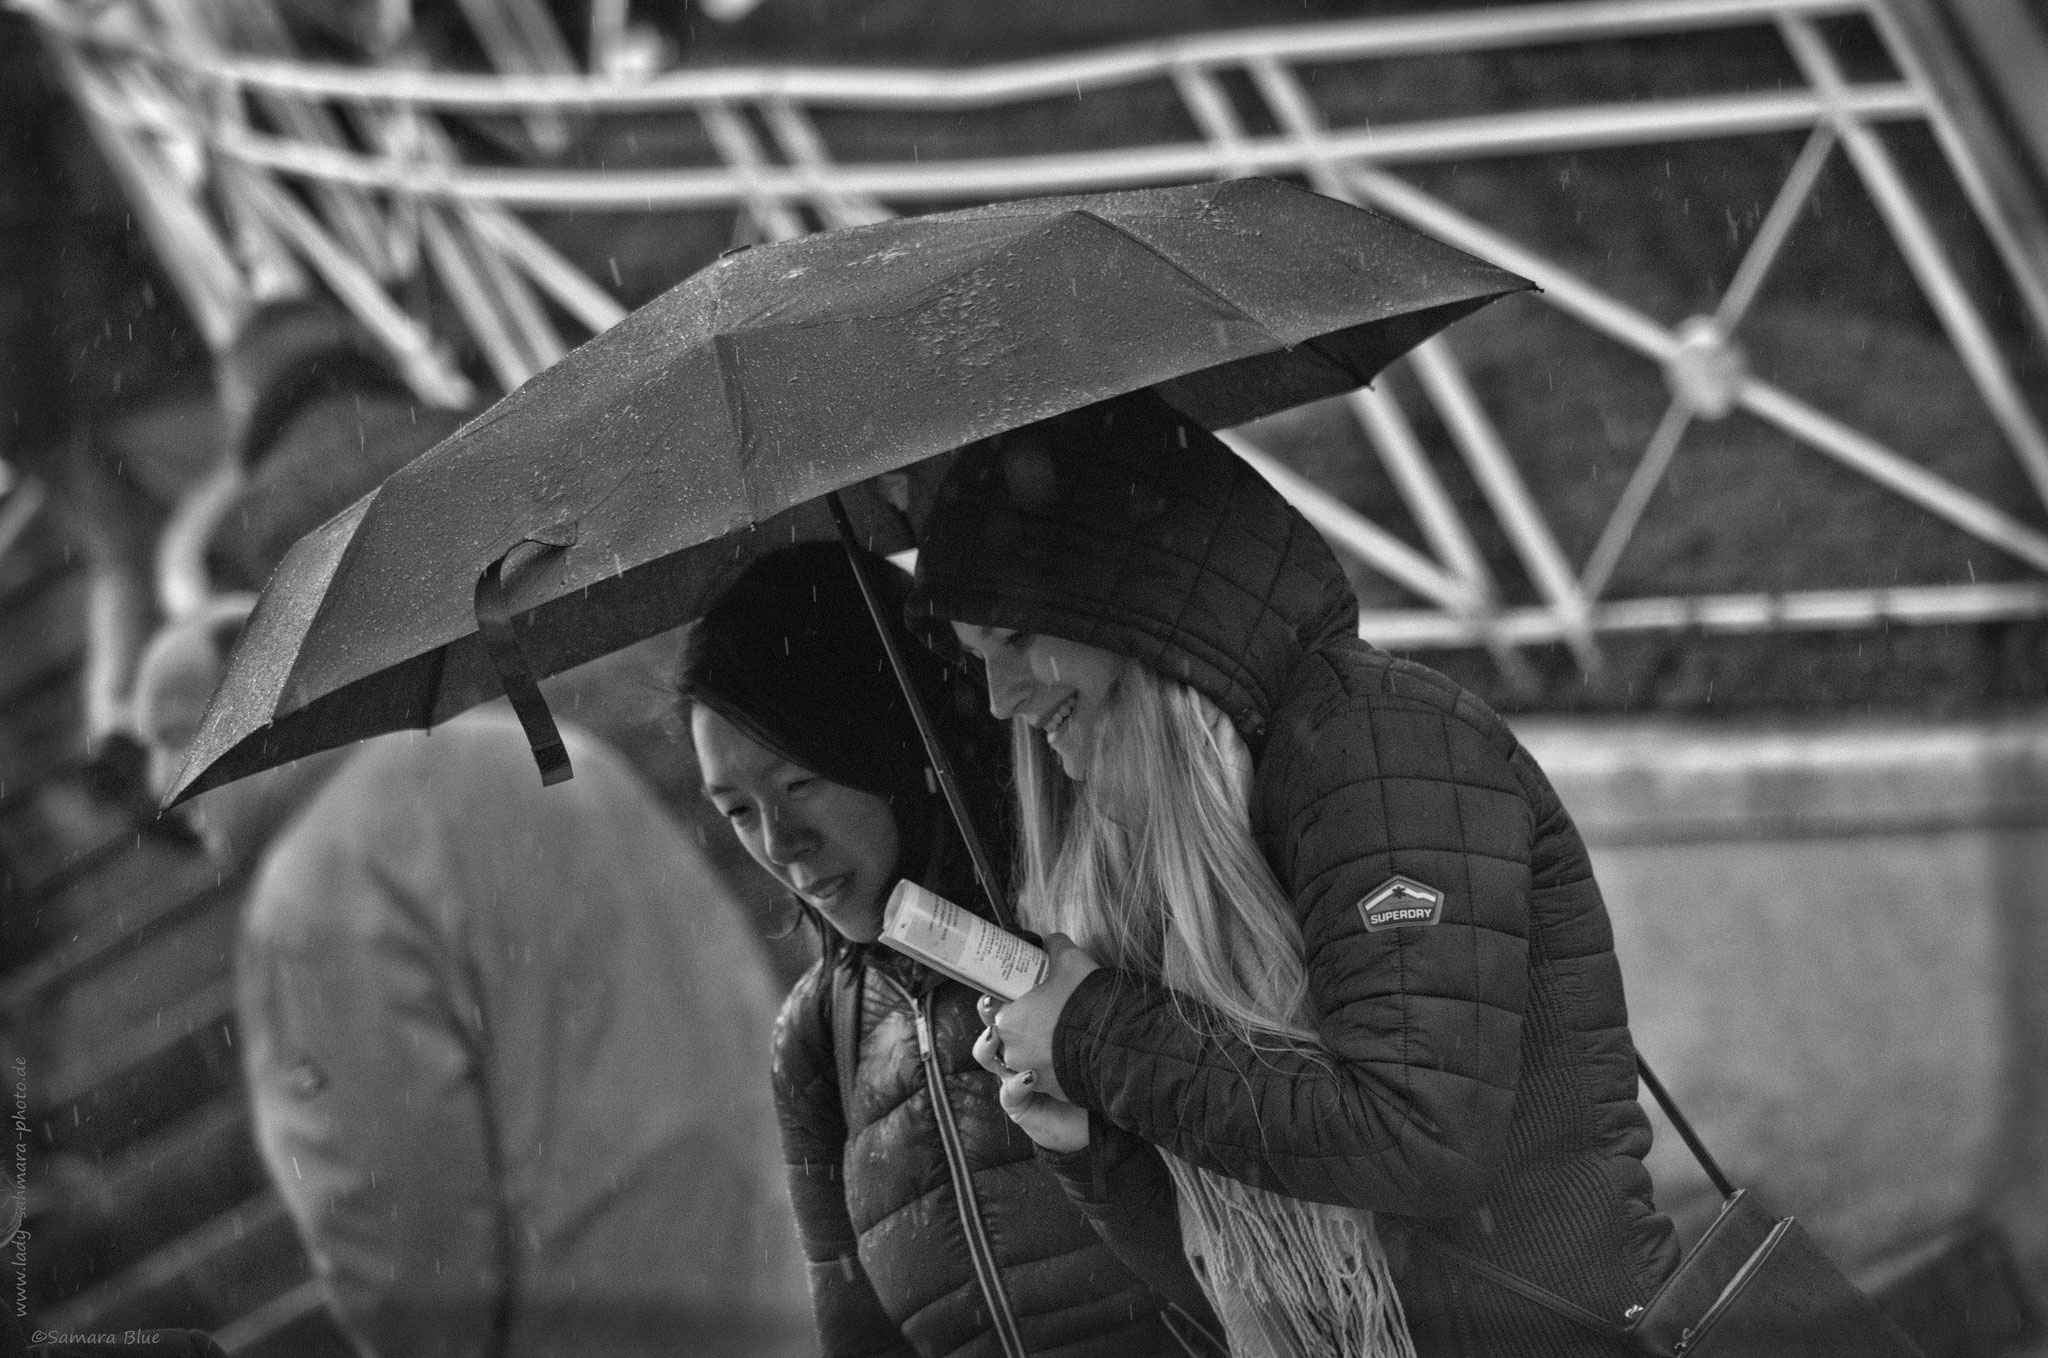 Under the Umbrella - Letzter Renntag der Saison 2017 Krefelder Rennclub 1997 e.V.  - Lady-Sahmara-Photo